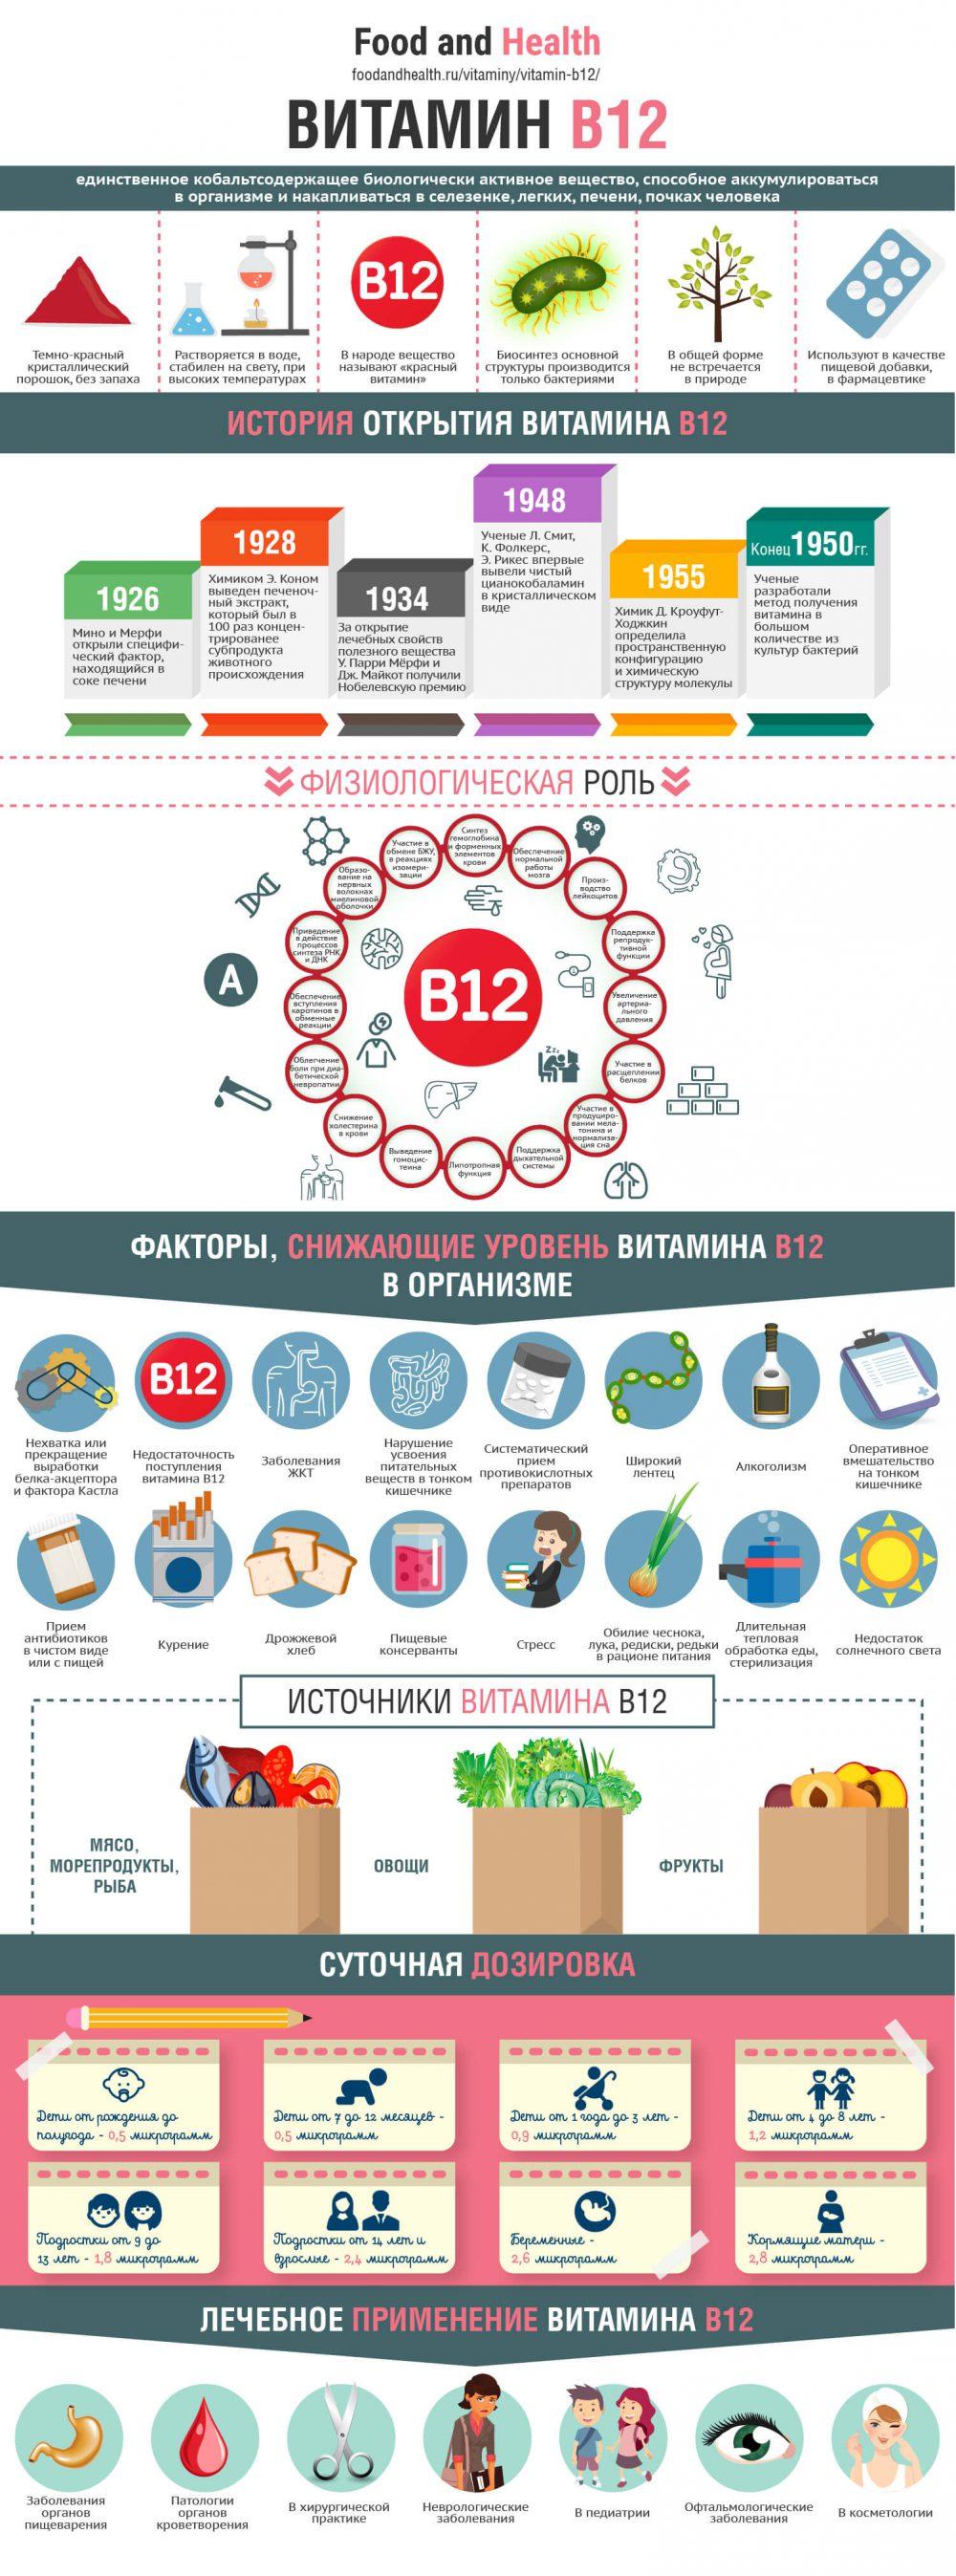 Витамин B12 - инфографика